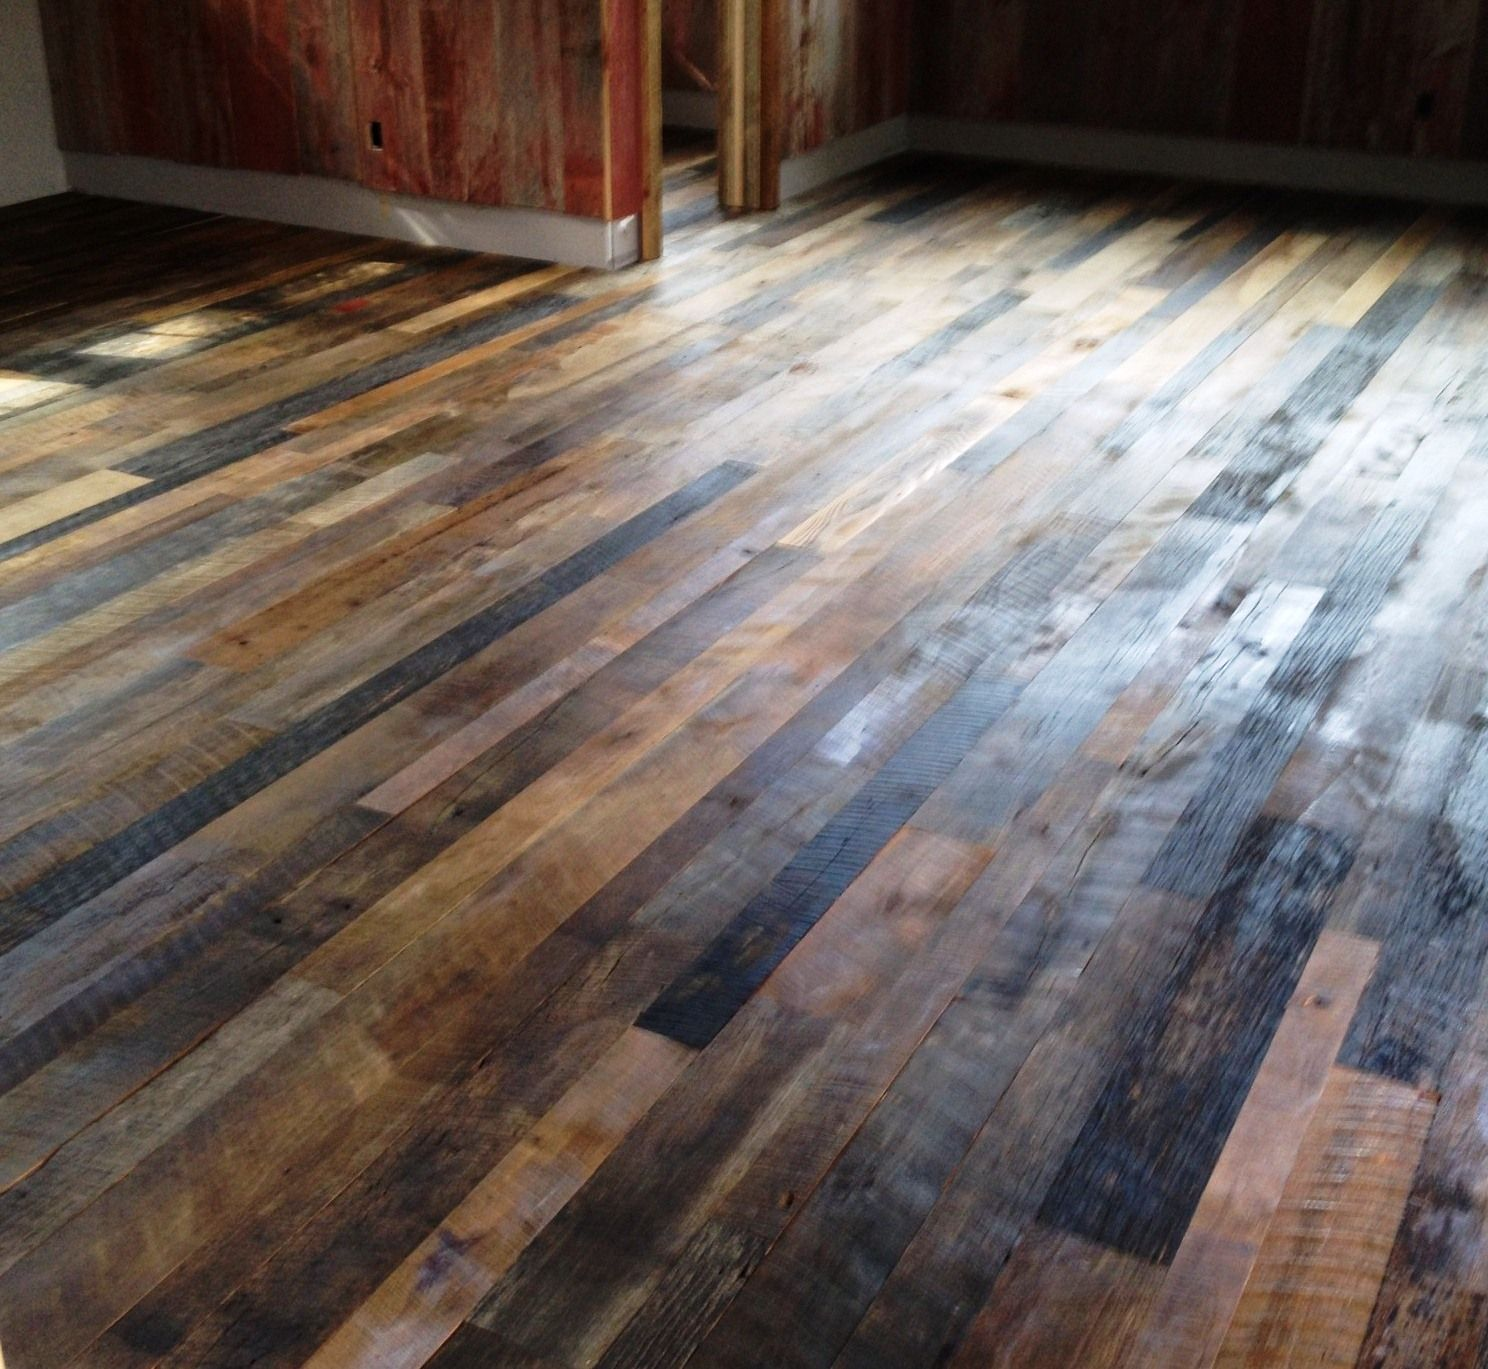 Reclaimed hardwood flooring chasing elixir reclaimed hardwood flooring wood tilestile dailygadgetfo Choice Image